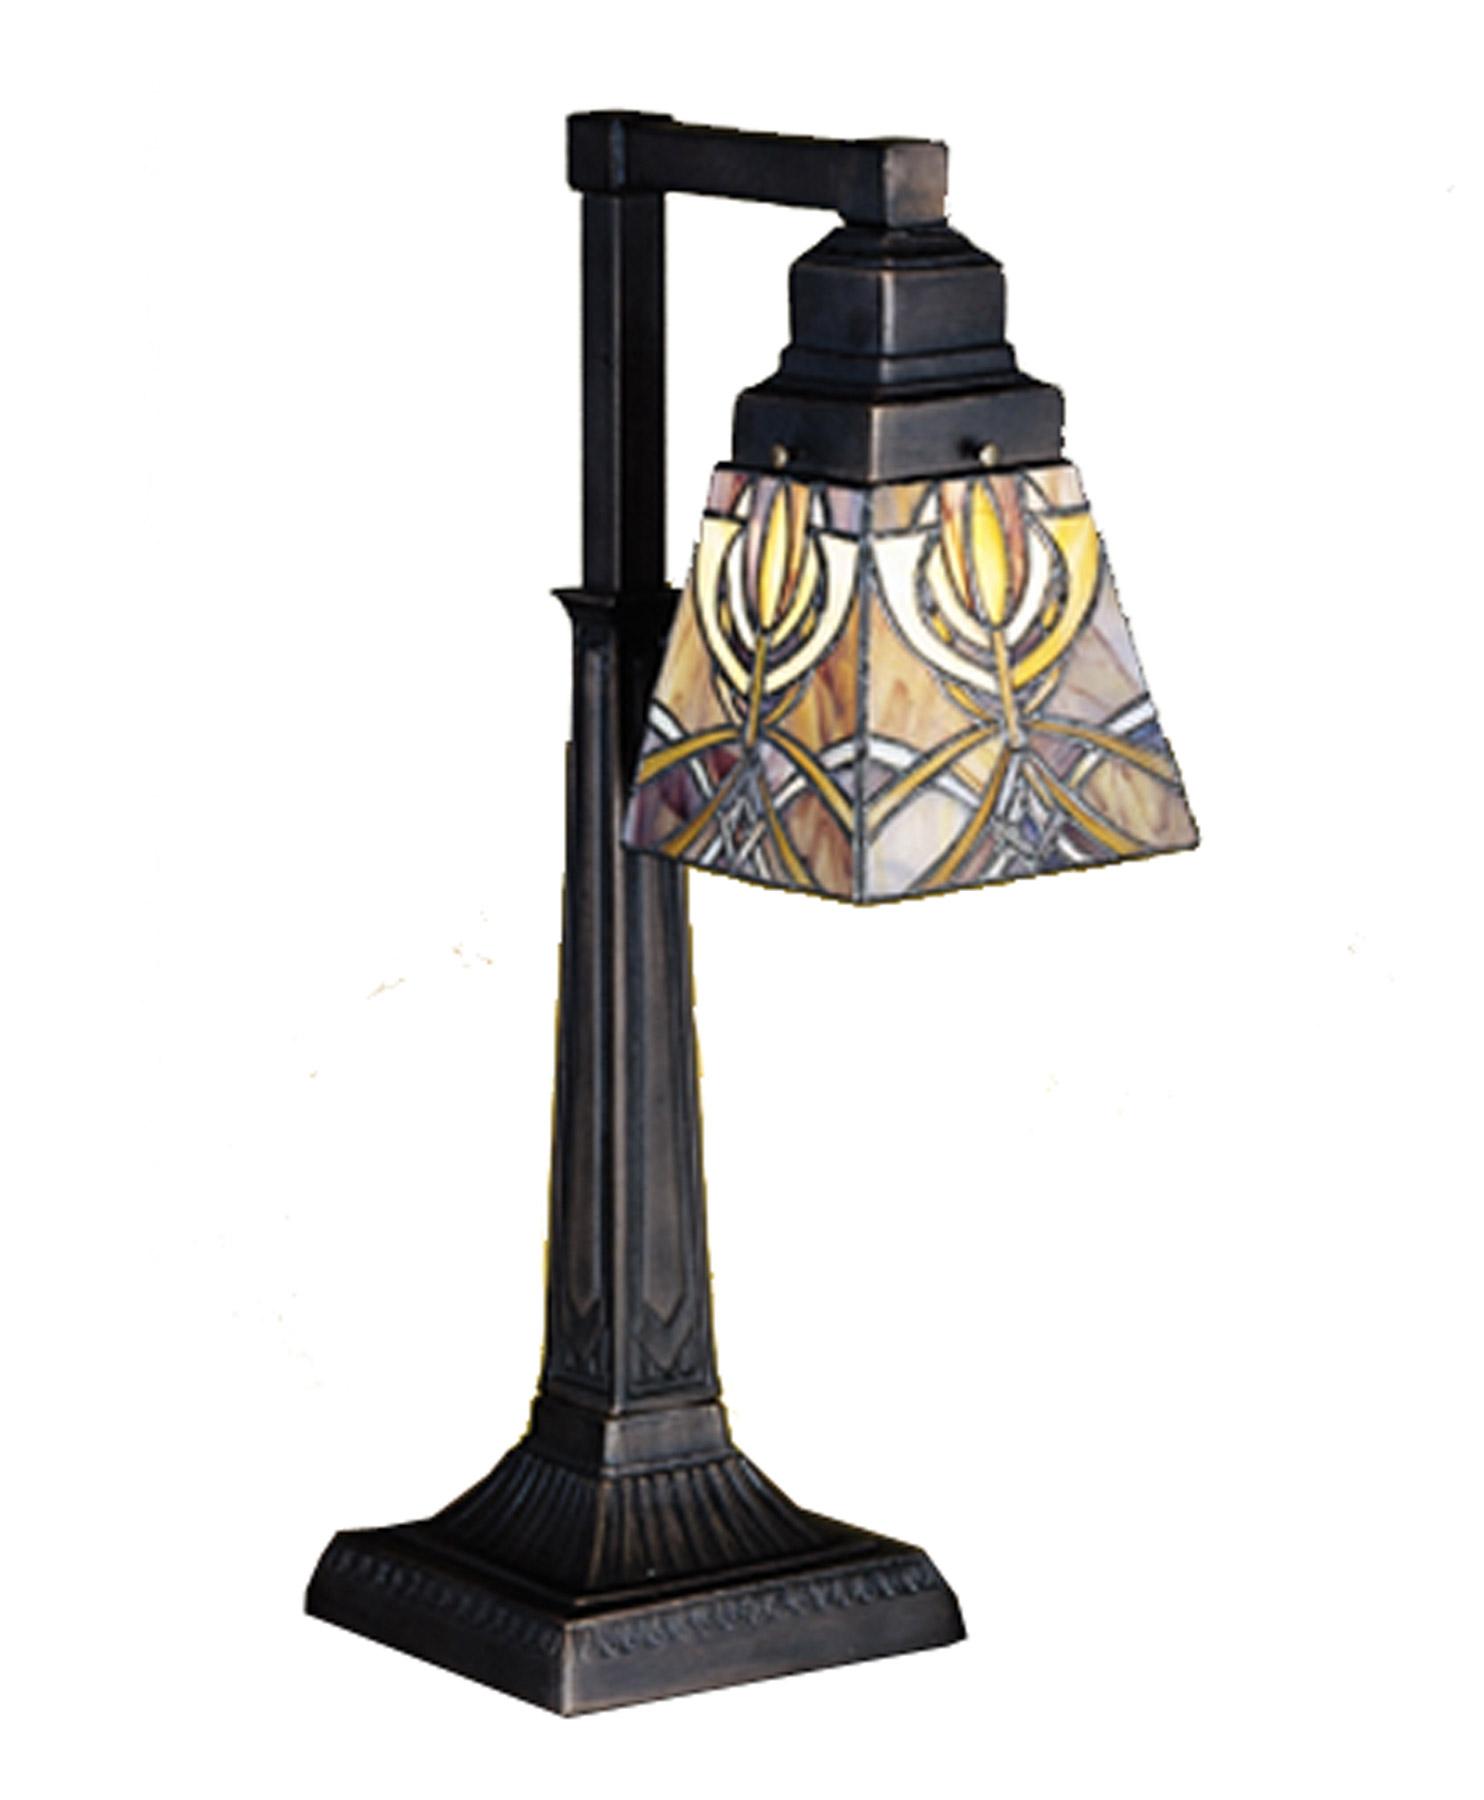 Mission Style Tiffany Lamp Sets